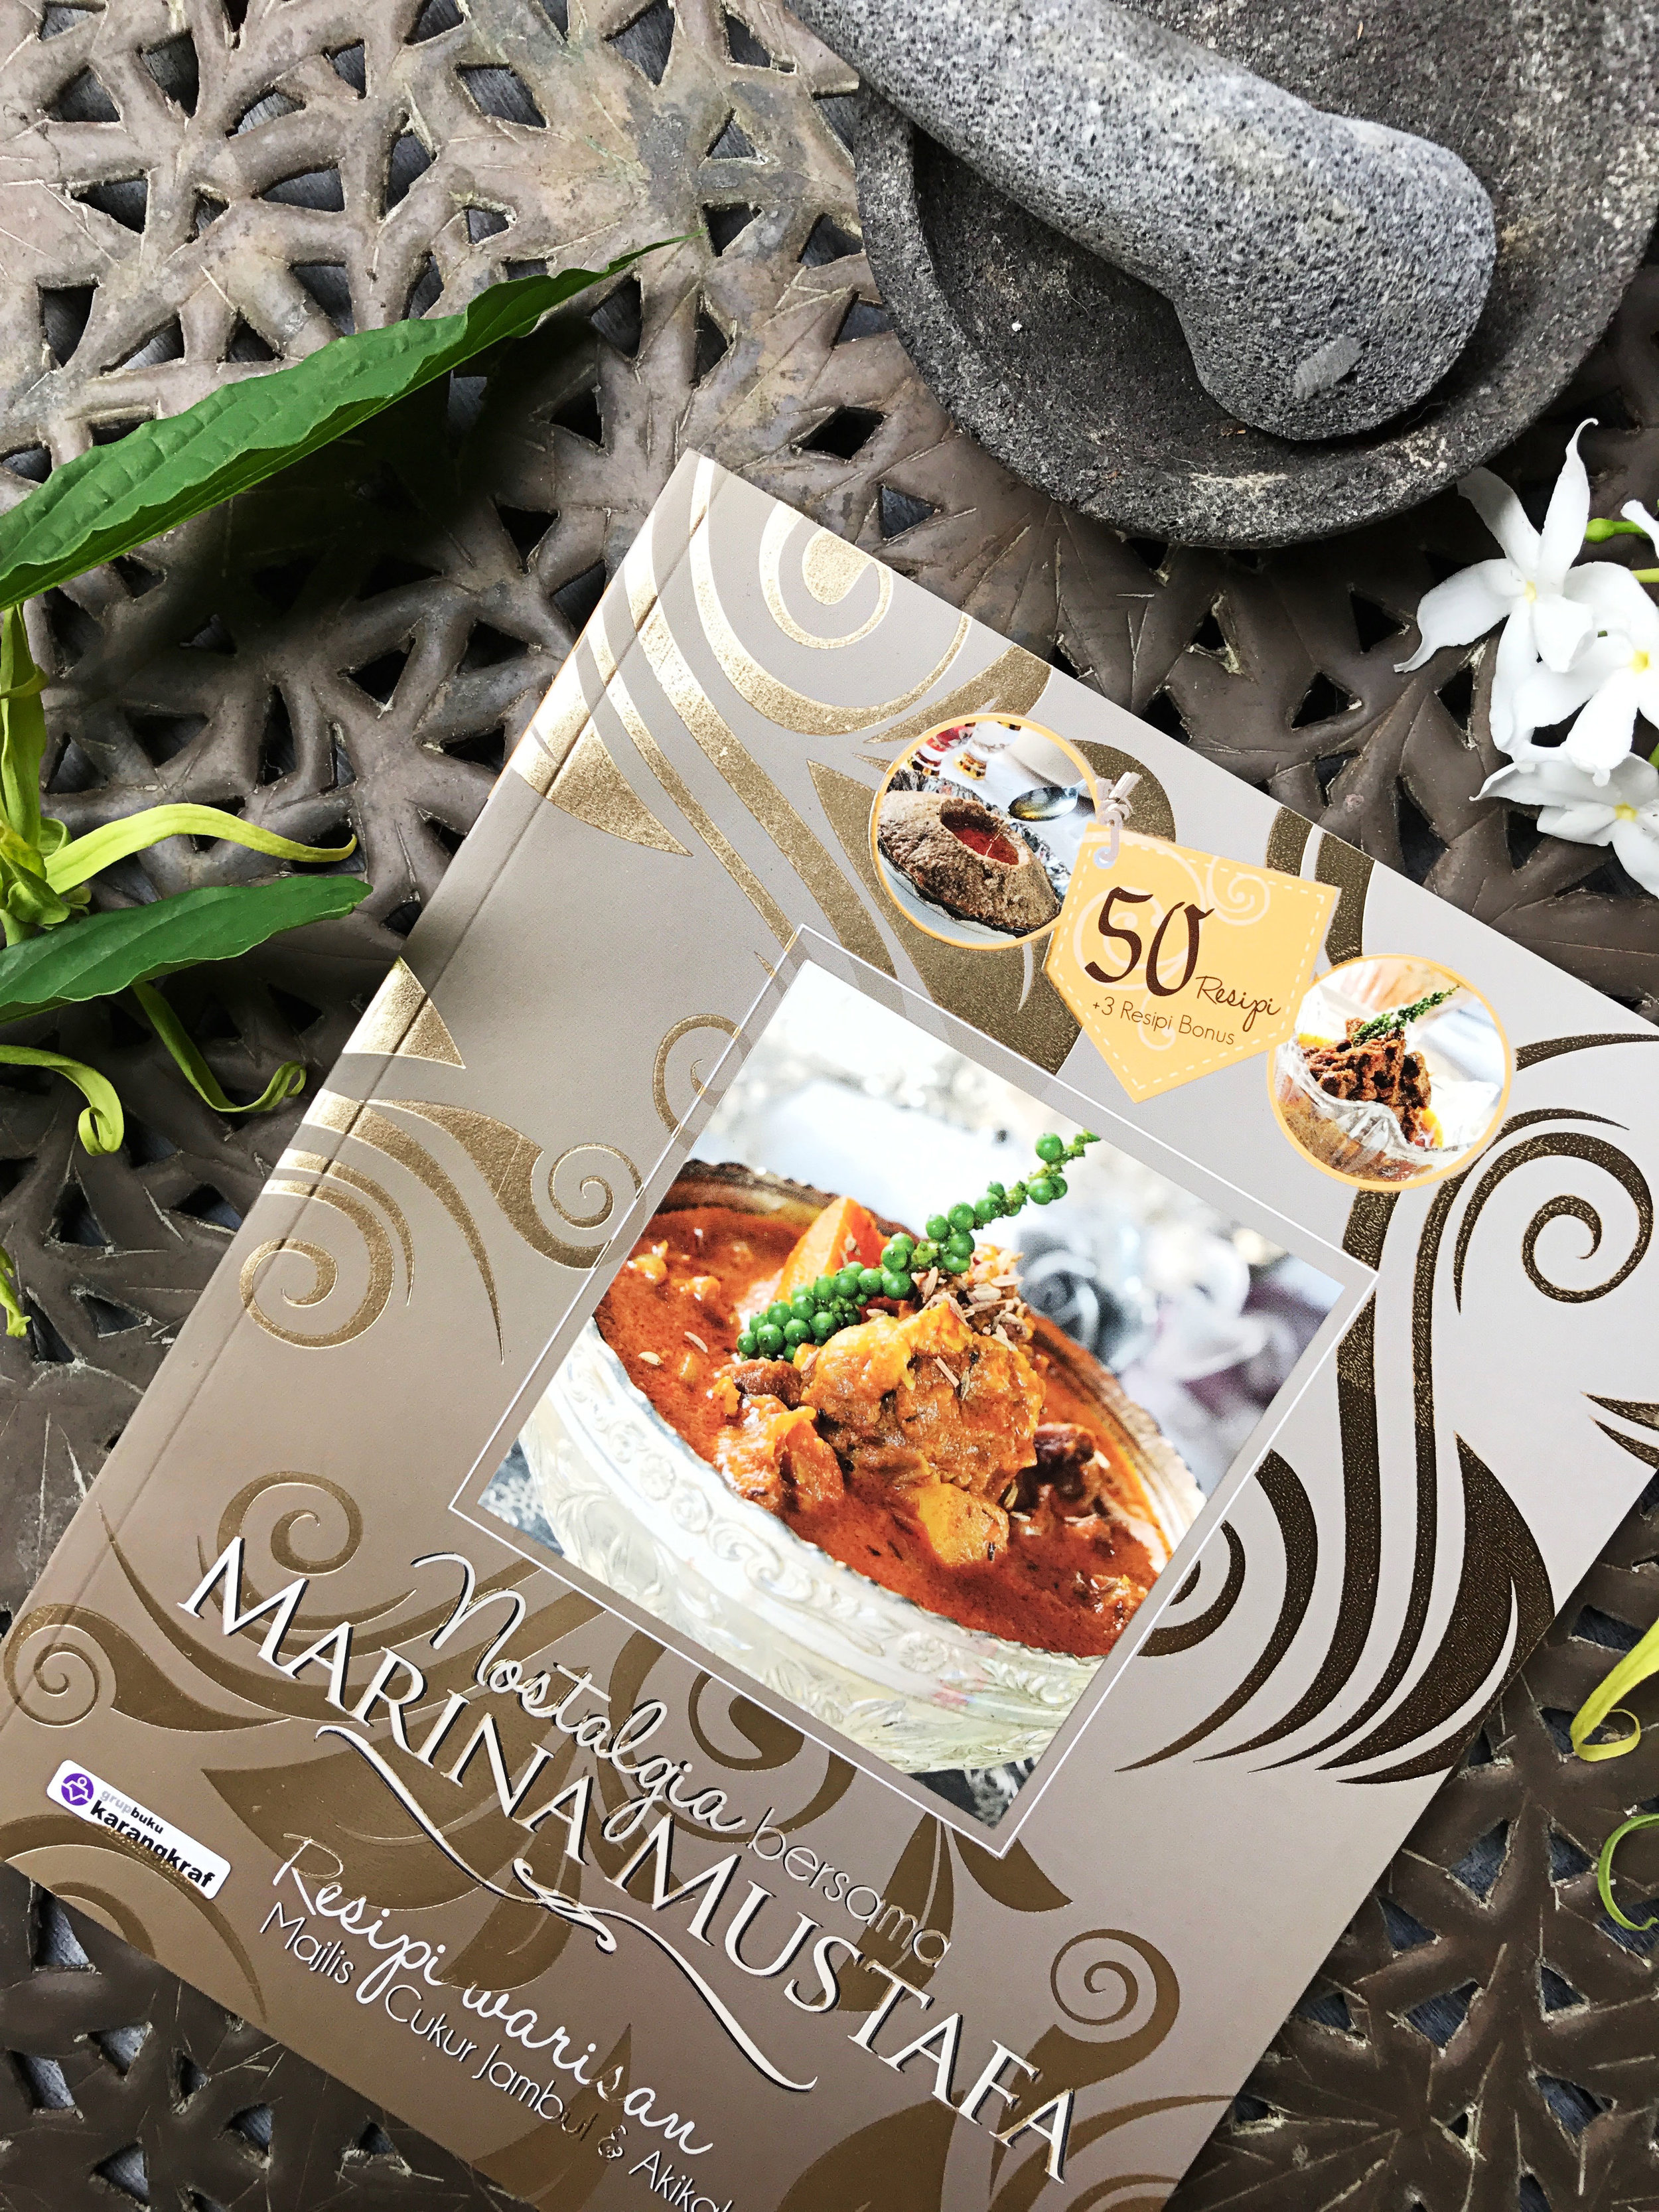 Nostalgia bersama Marina Mustafa - Family heirloom recipes, focusing on the celebratory of Cukur Jambul & Akikah to welcome a newborn into the world.